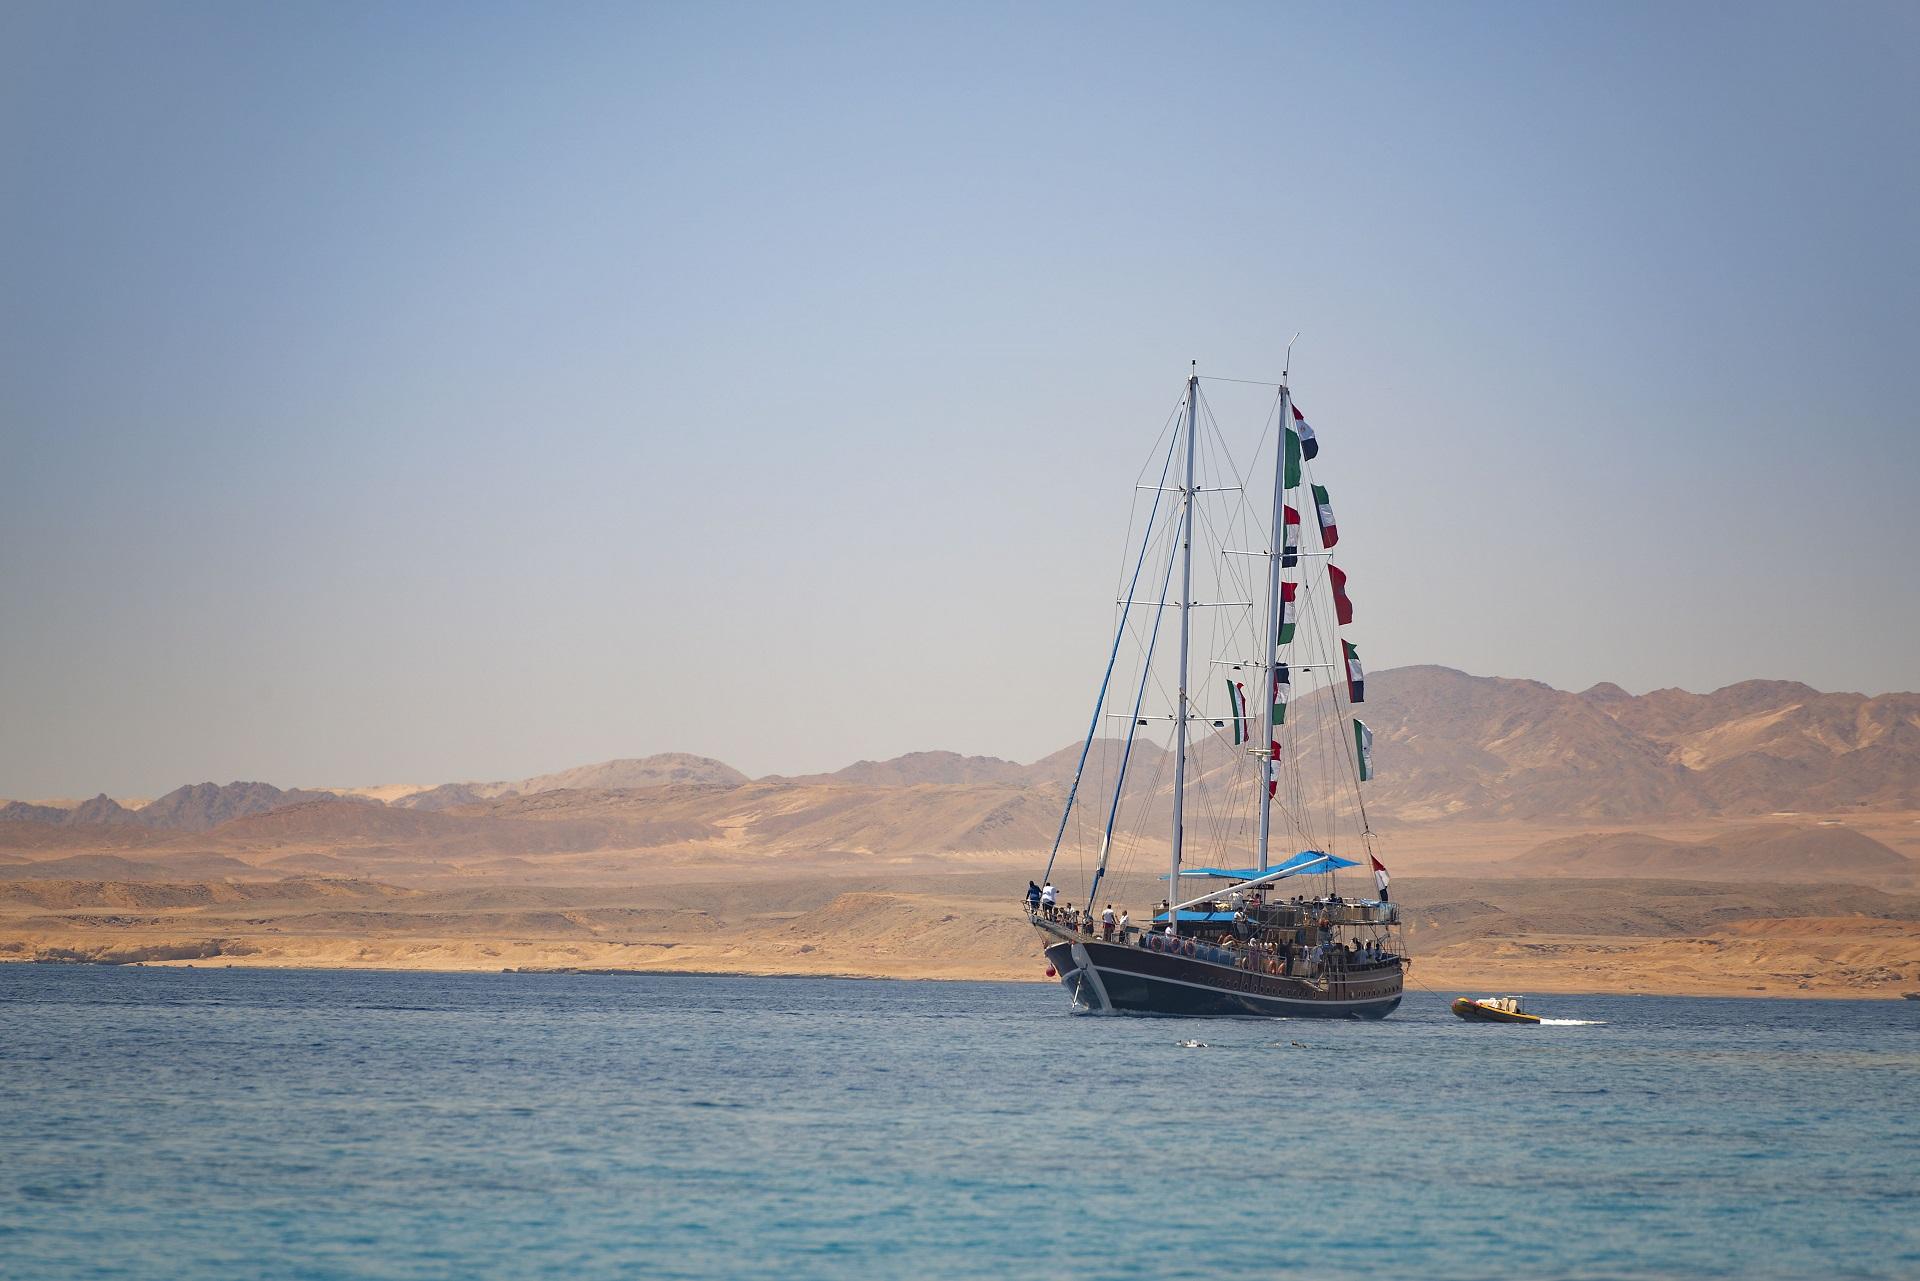 sea-ship-sailing-sunset-view-sharm-el-sheikh-egypt